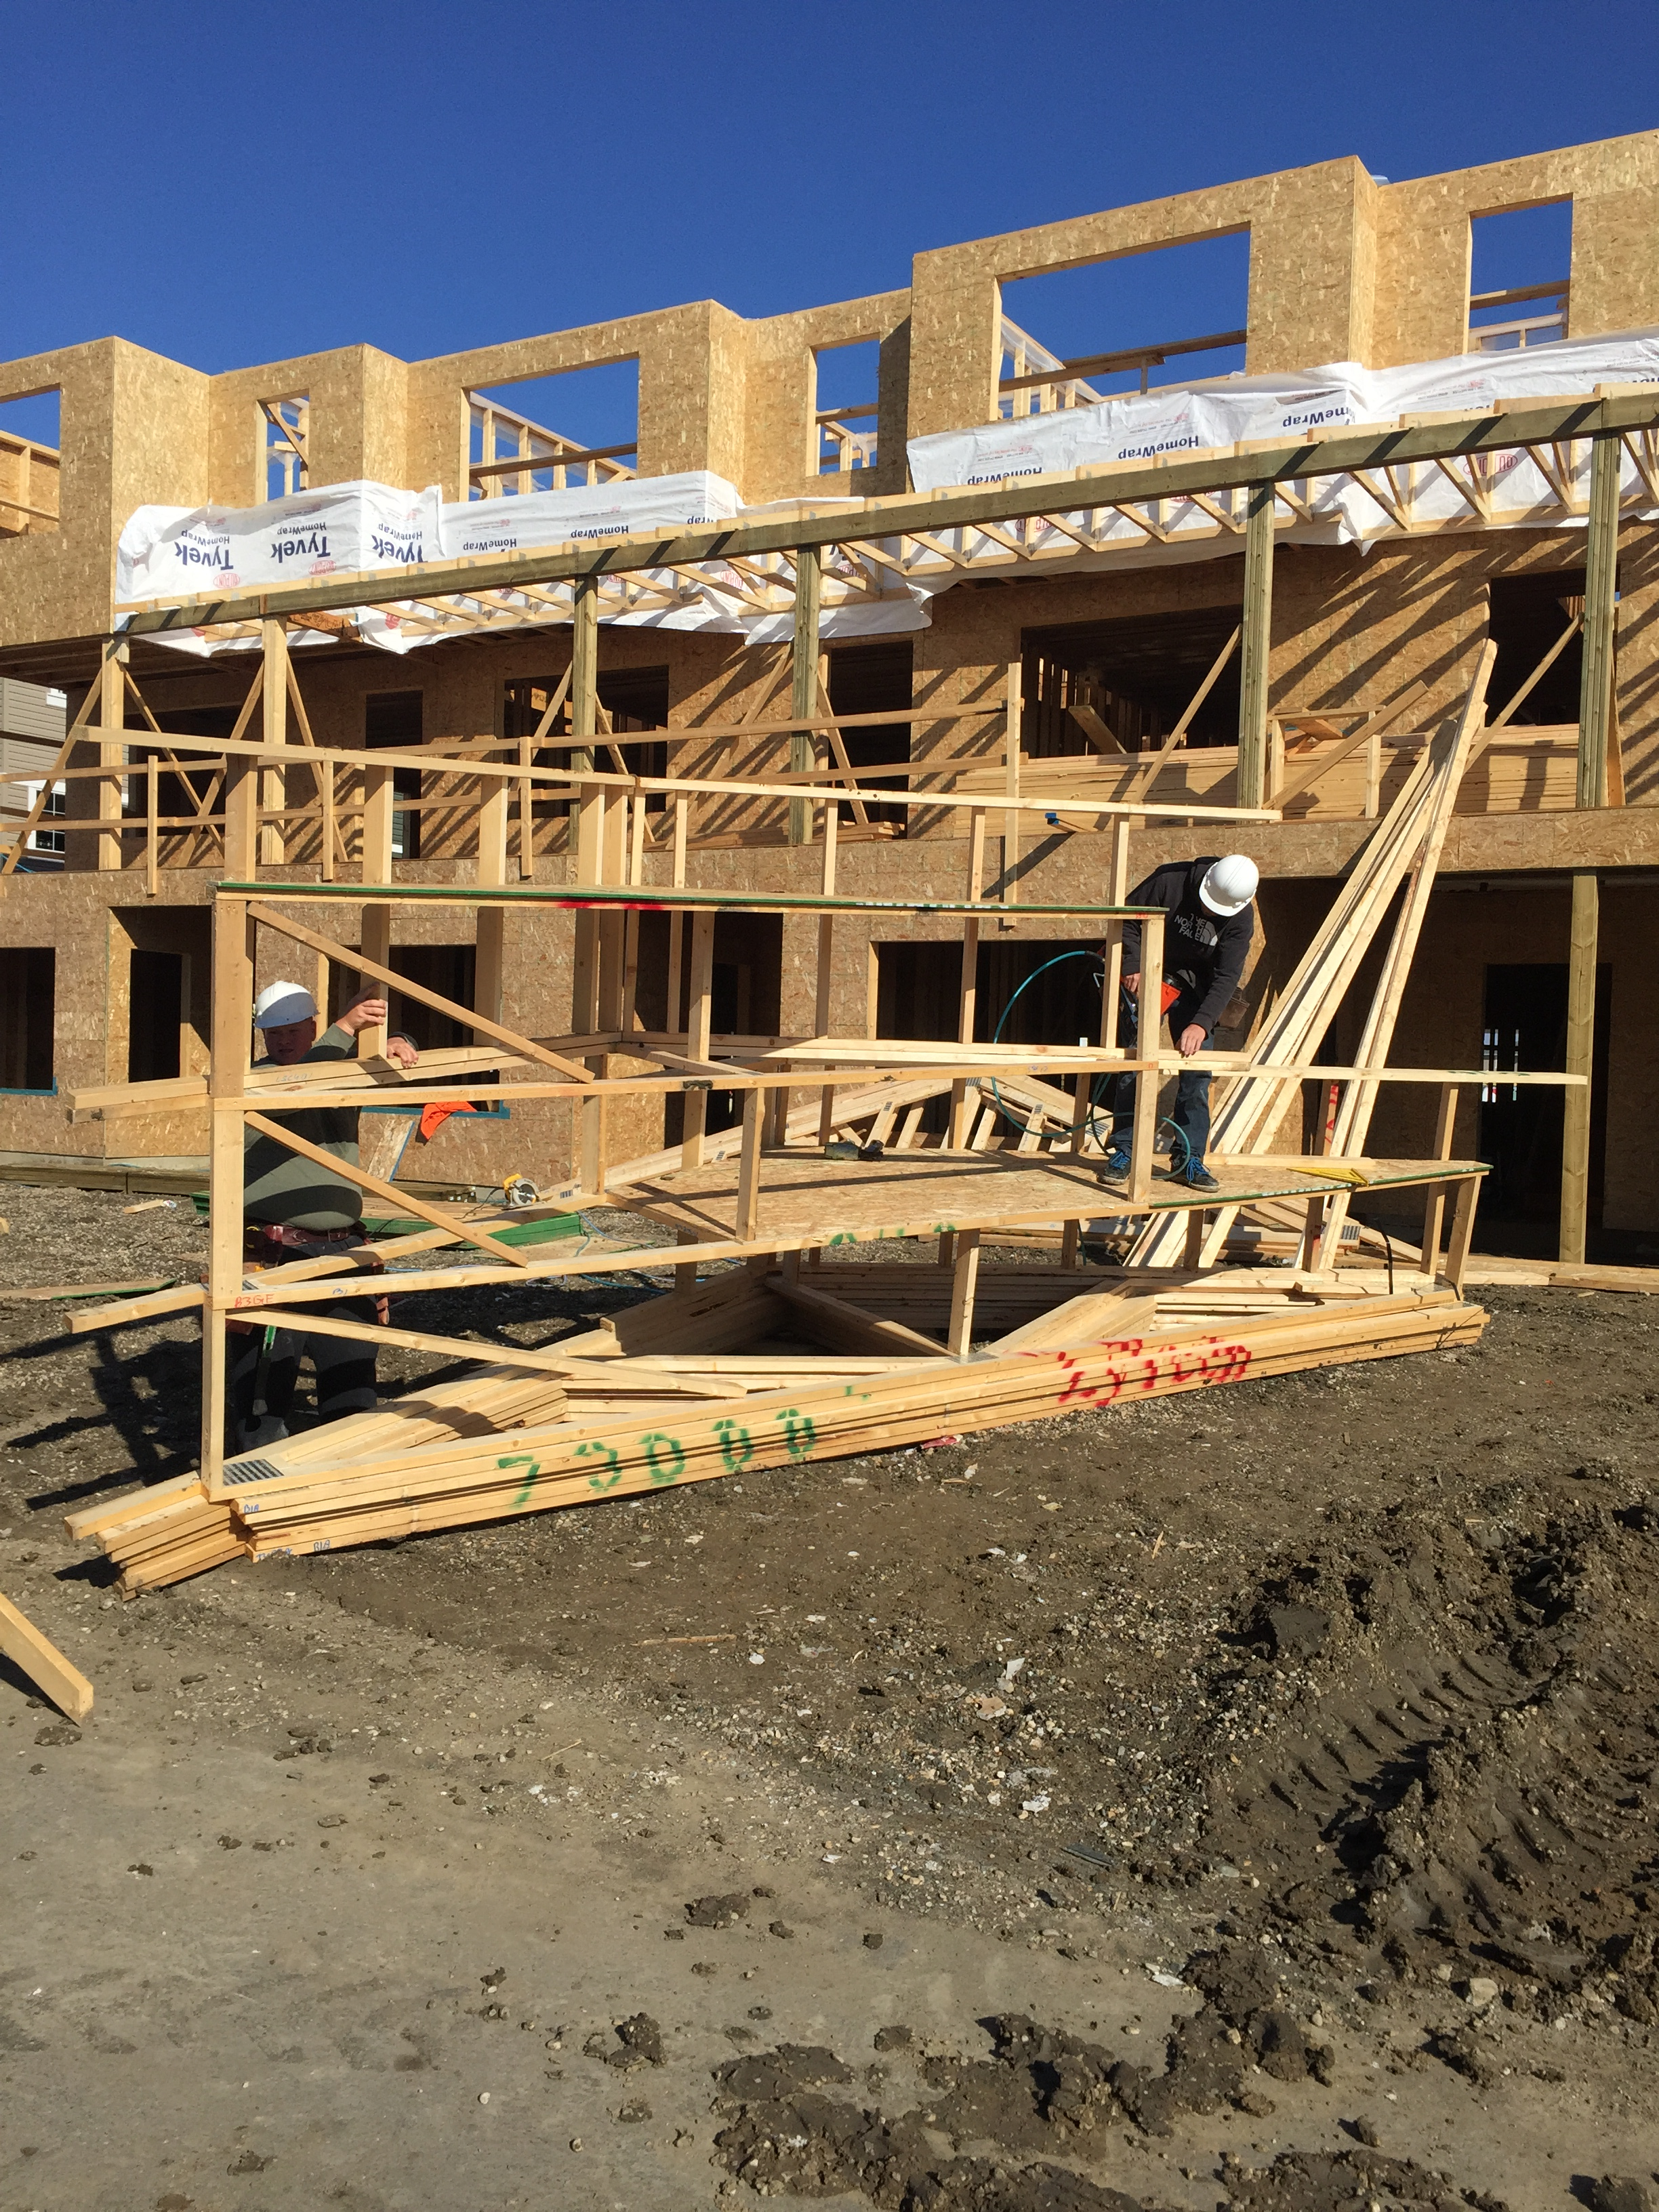 Winnipeg Commercial, Commercial Winnipeg, Commercial Construction, Commercial Builder in Winnipeg, Property Developer Winnipeg, Winnipeg Builder, Builders in Winnipeg, Apartment Construction Winnipeg, Condo Construction Winnipeg, Condominium Developer, Build Condominiums, New Construction Winnipeg, Construction Companies Winnipeg, Manitoba Commercial Construction